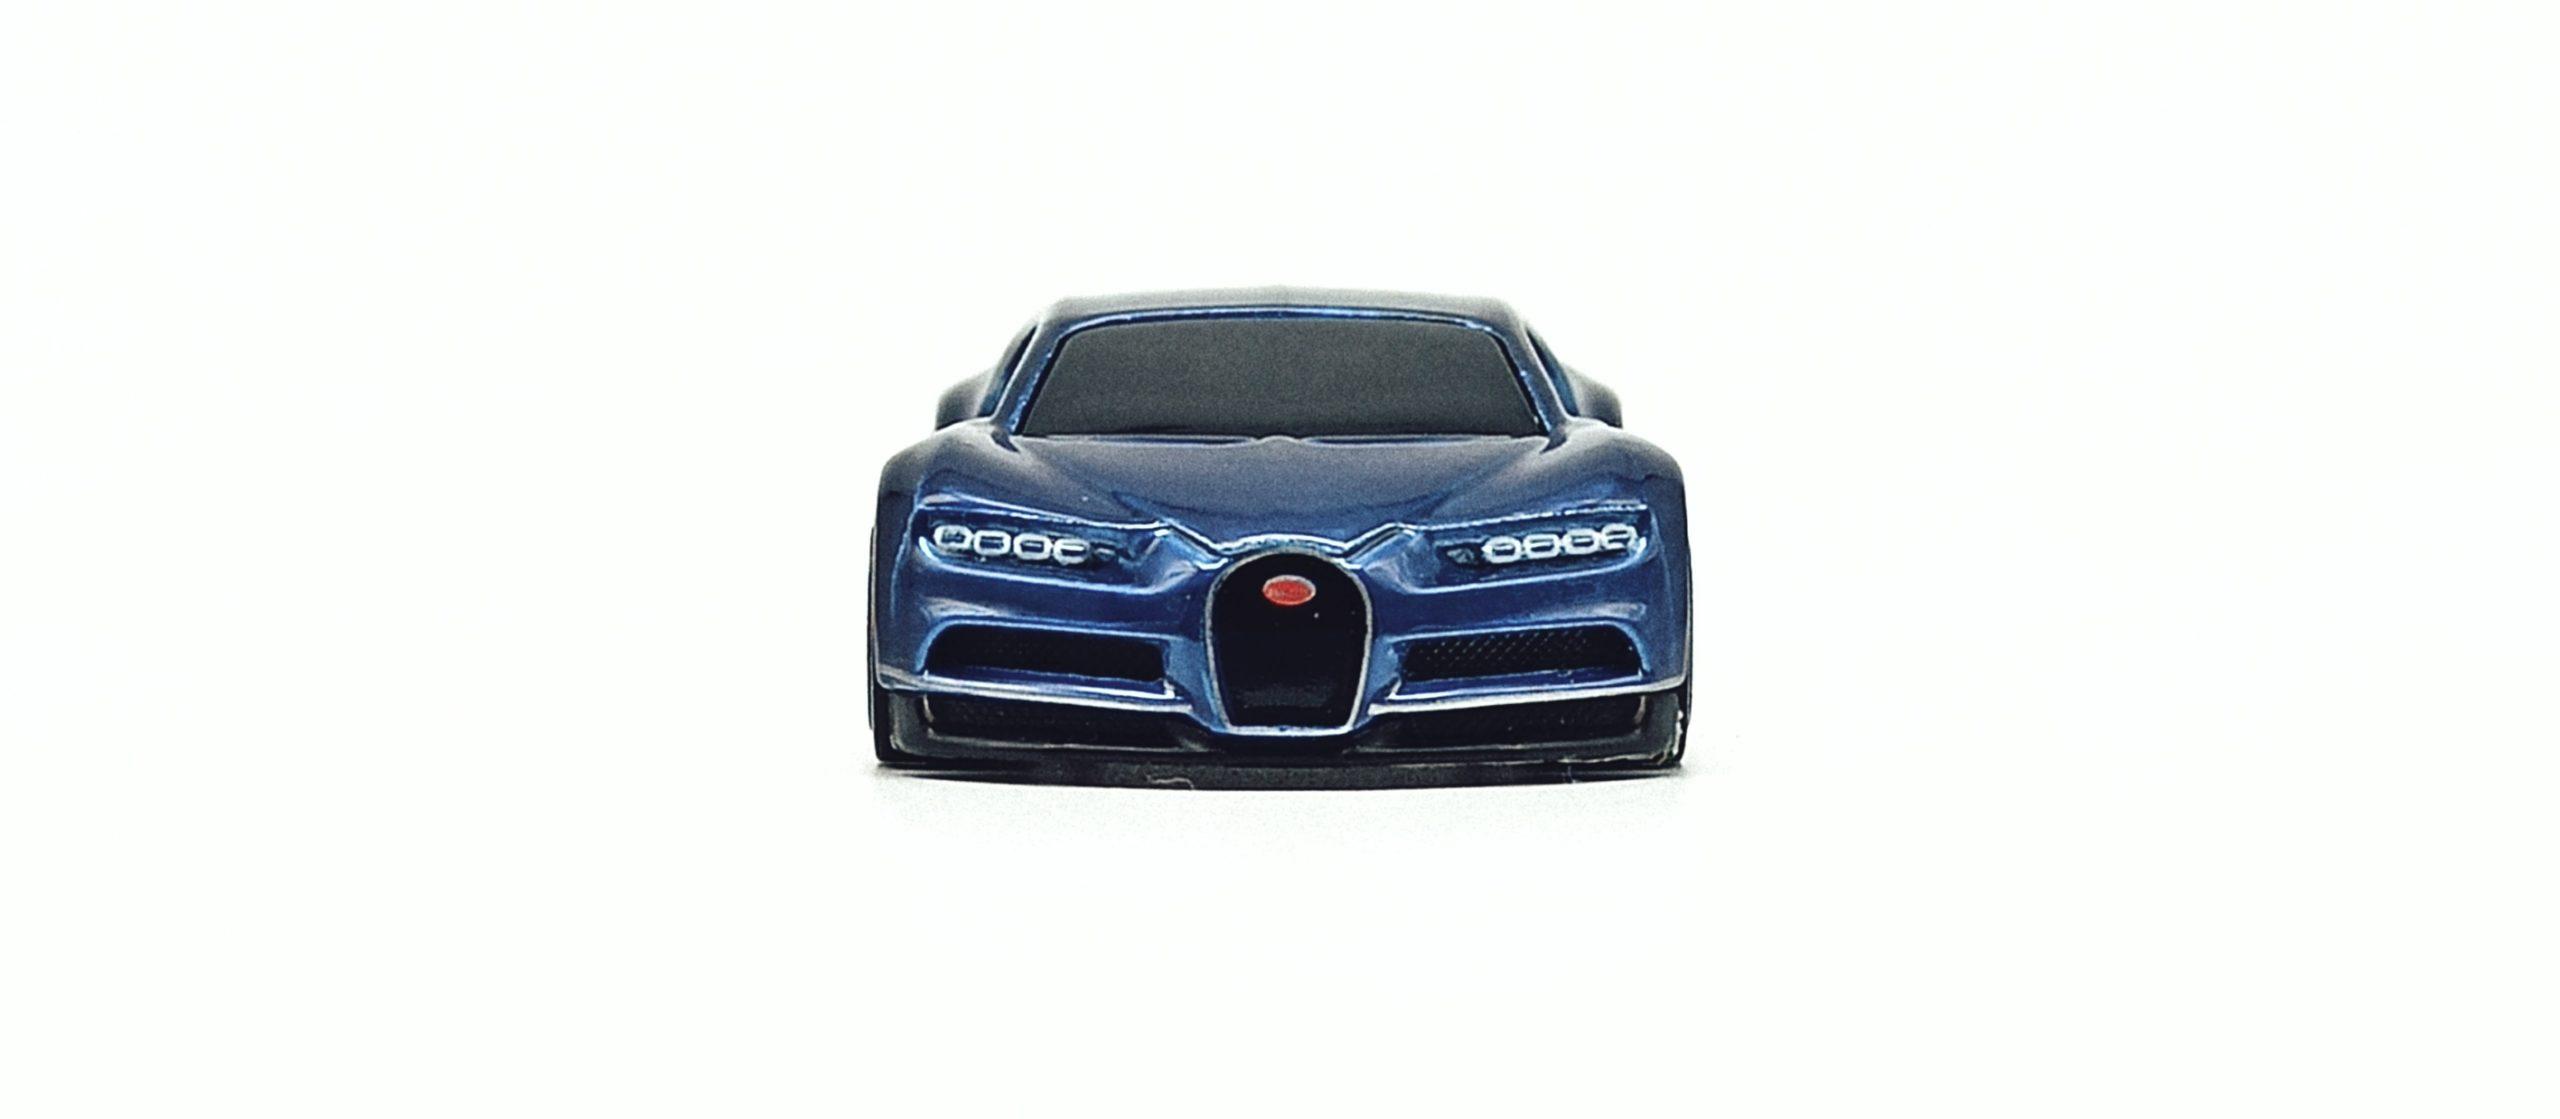 Hot Wheels id '16 Bugatti Chiron (HBG00) 2021 HW Turbo (3/4) spectraflame blue front